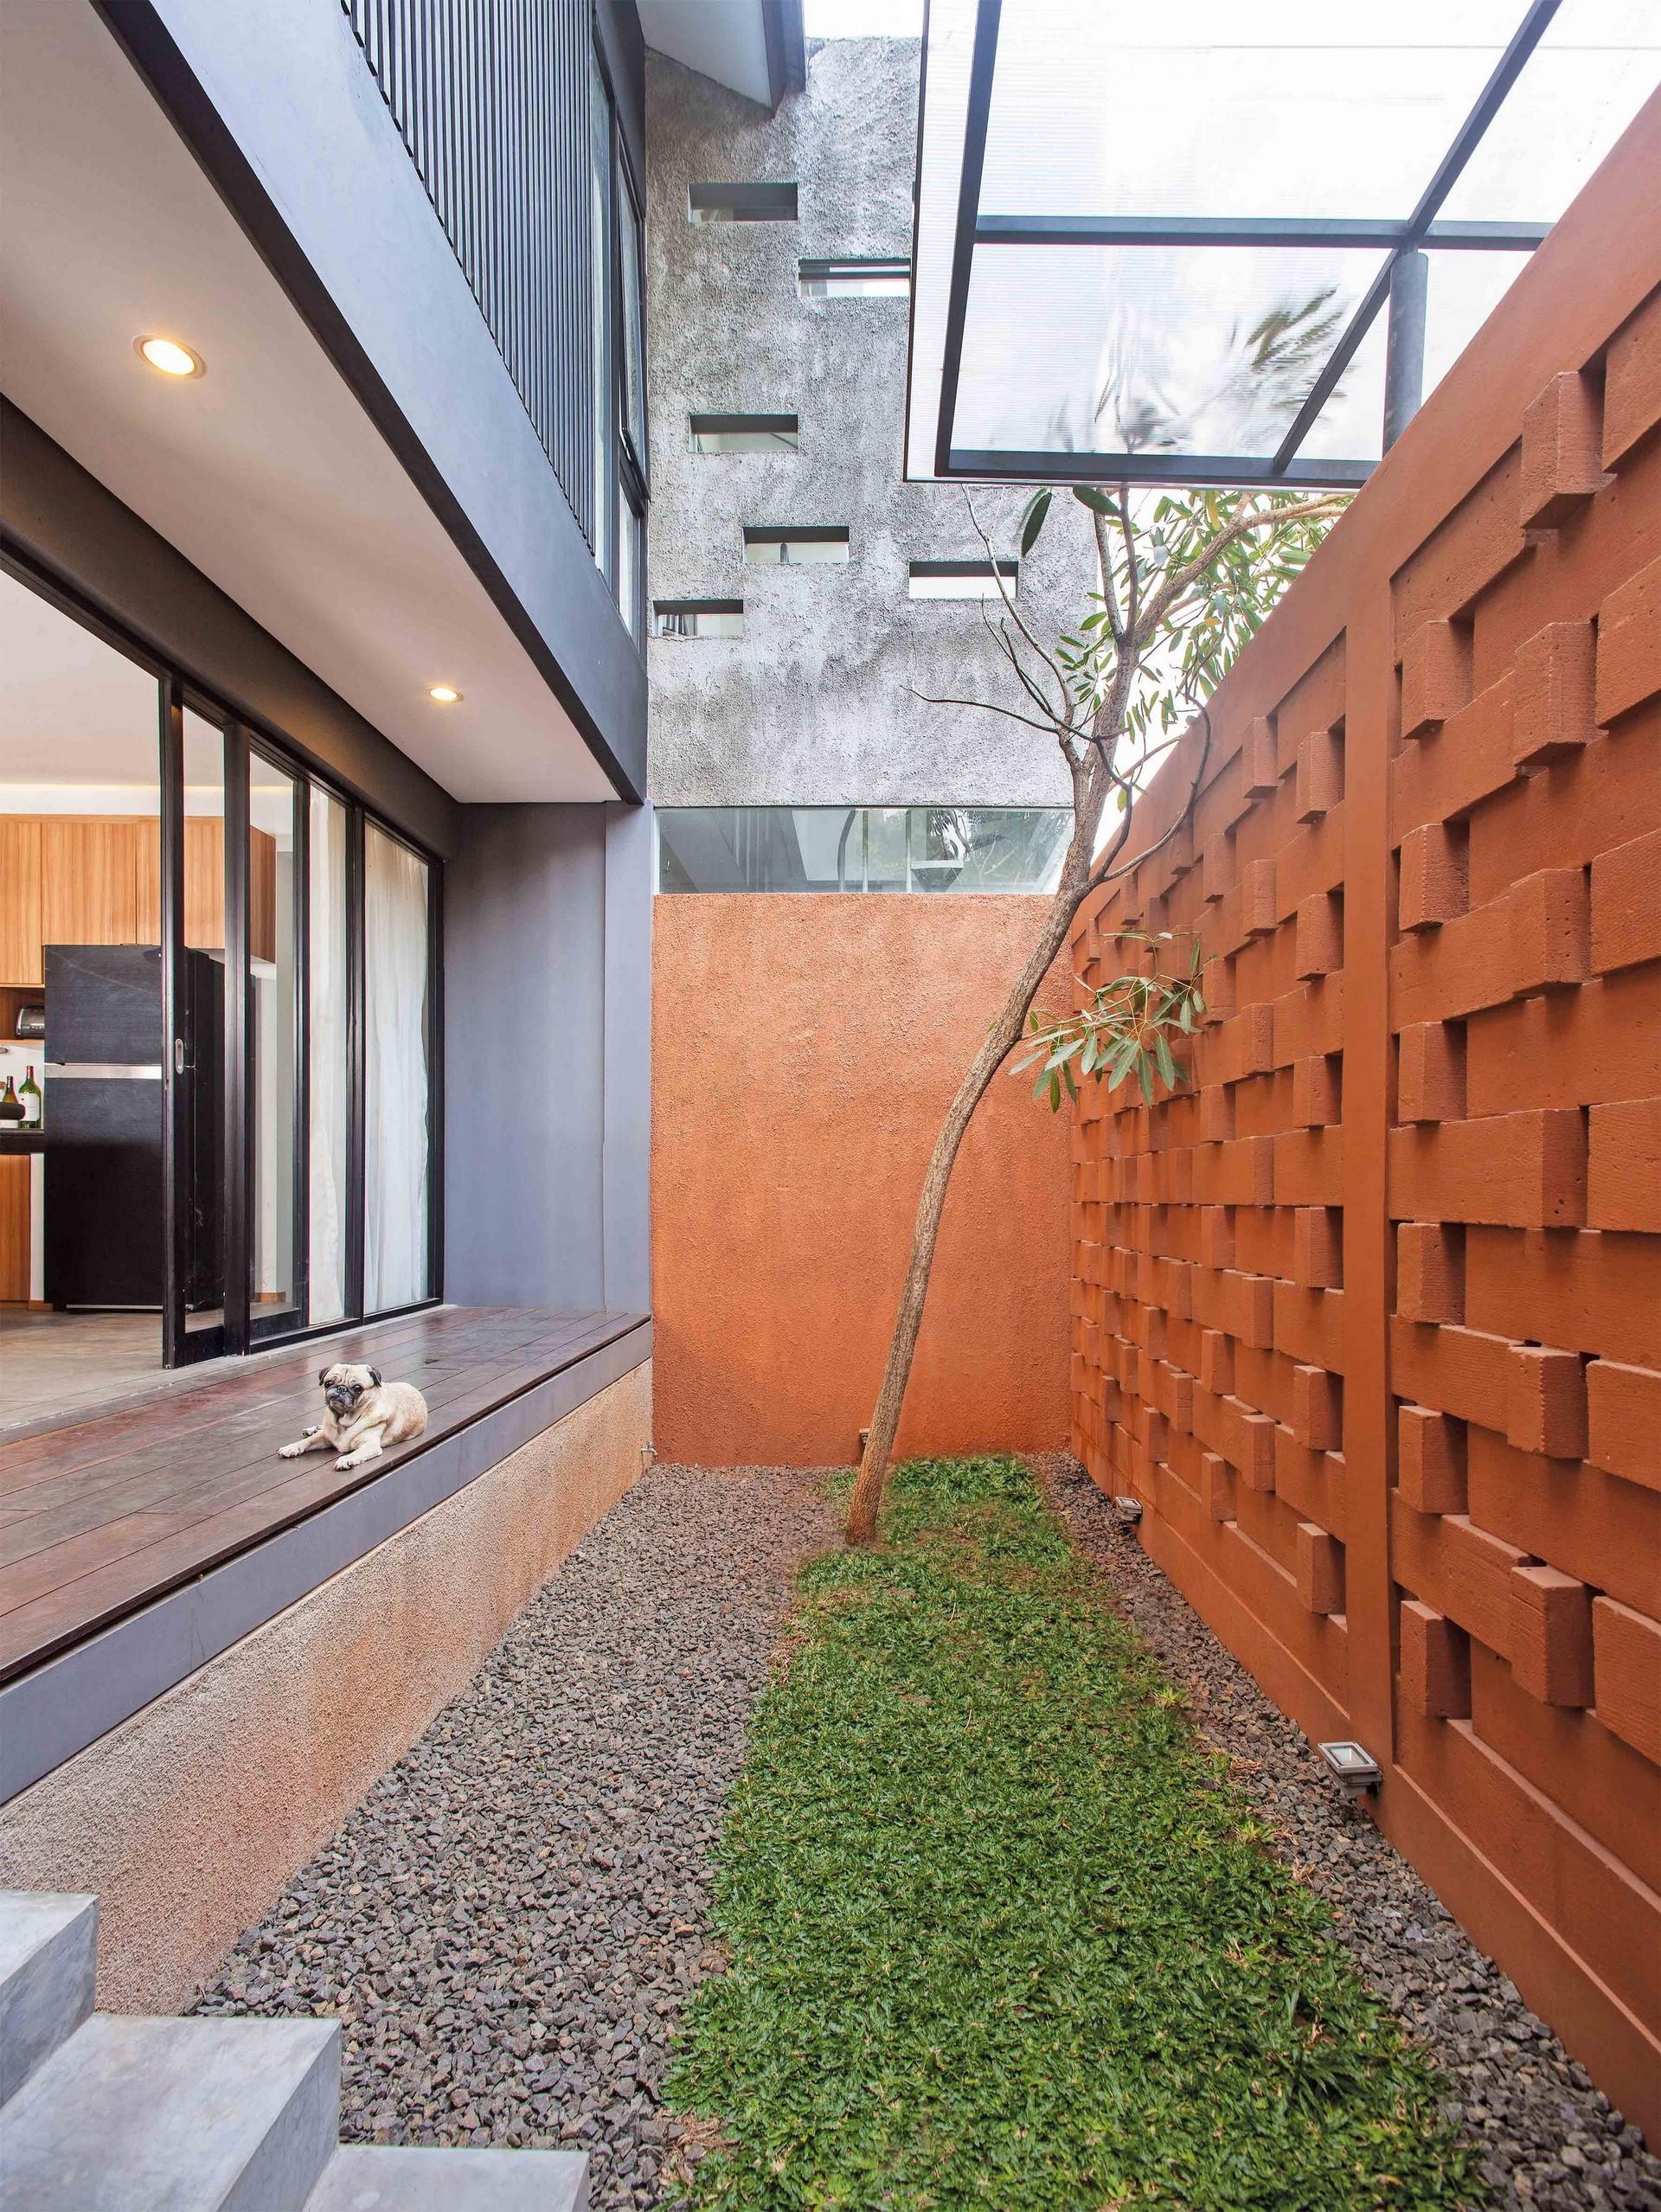 istakagrha-_07raw-architecture